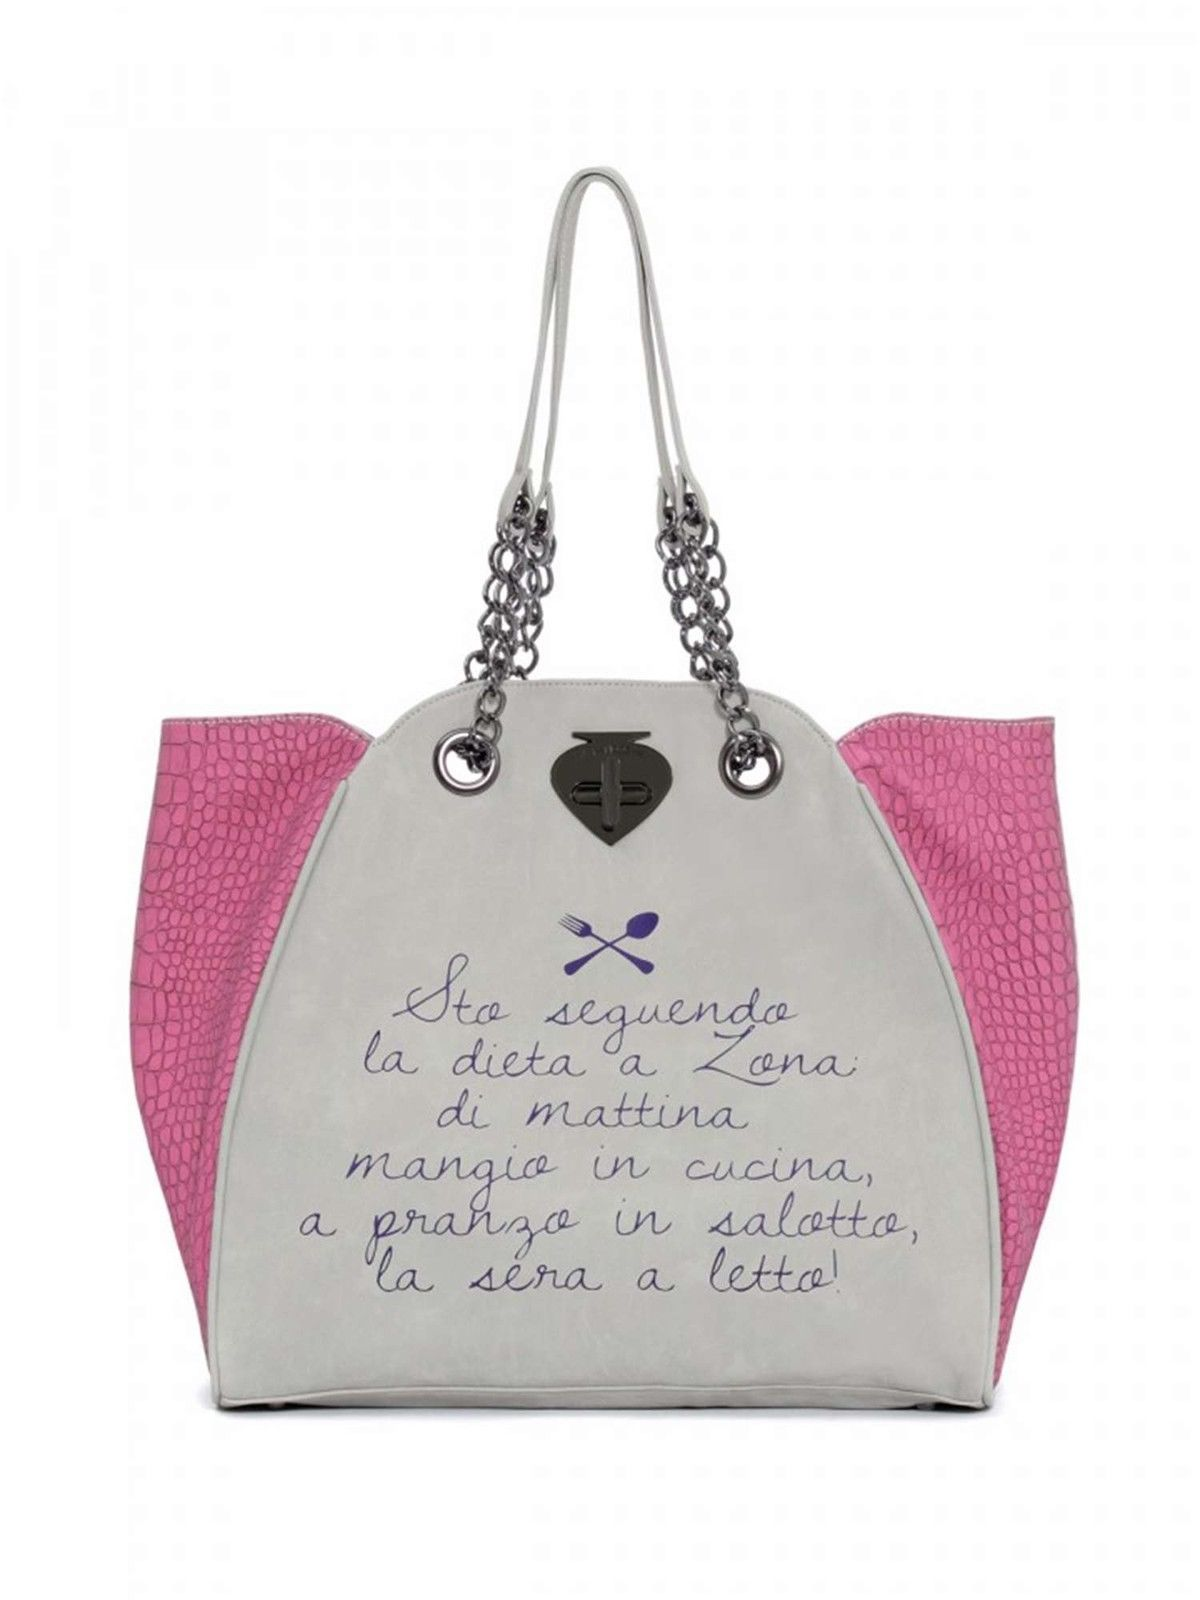 3860fe55d9 Le Pandorine 518 Borse Accessori | eBay | Le Pandorine: frasi a ...